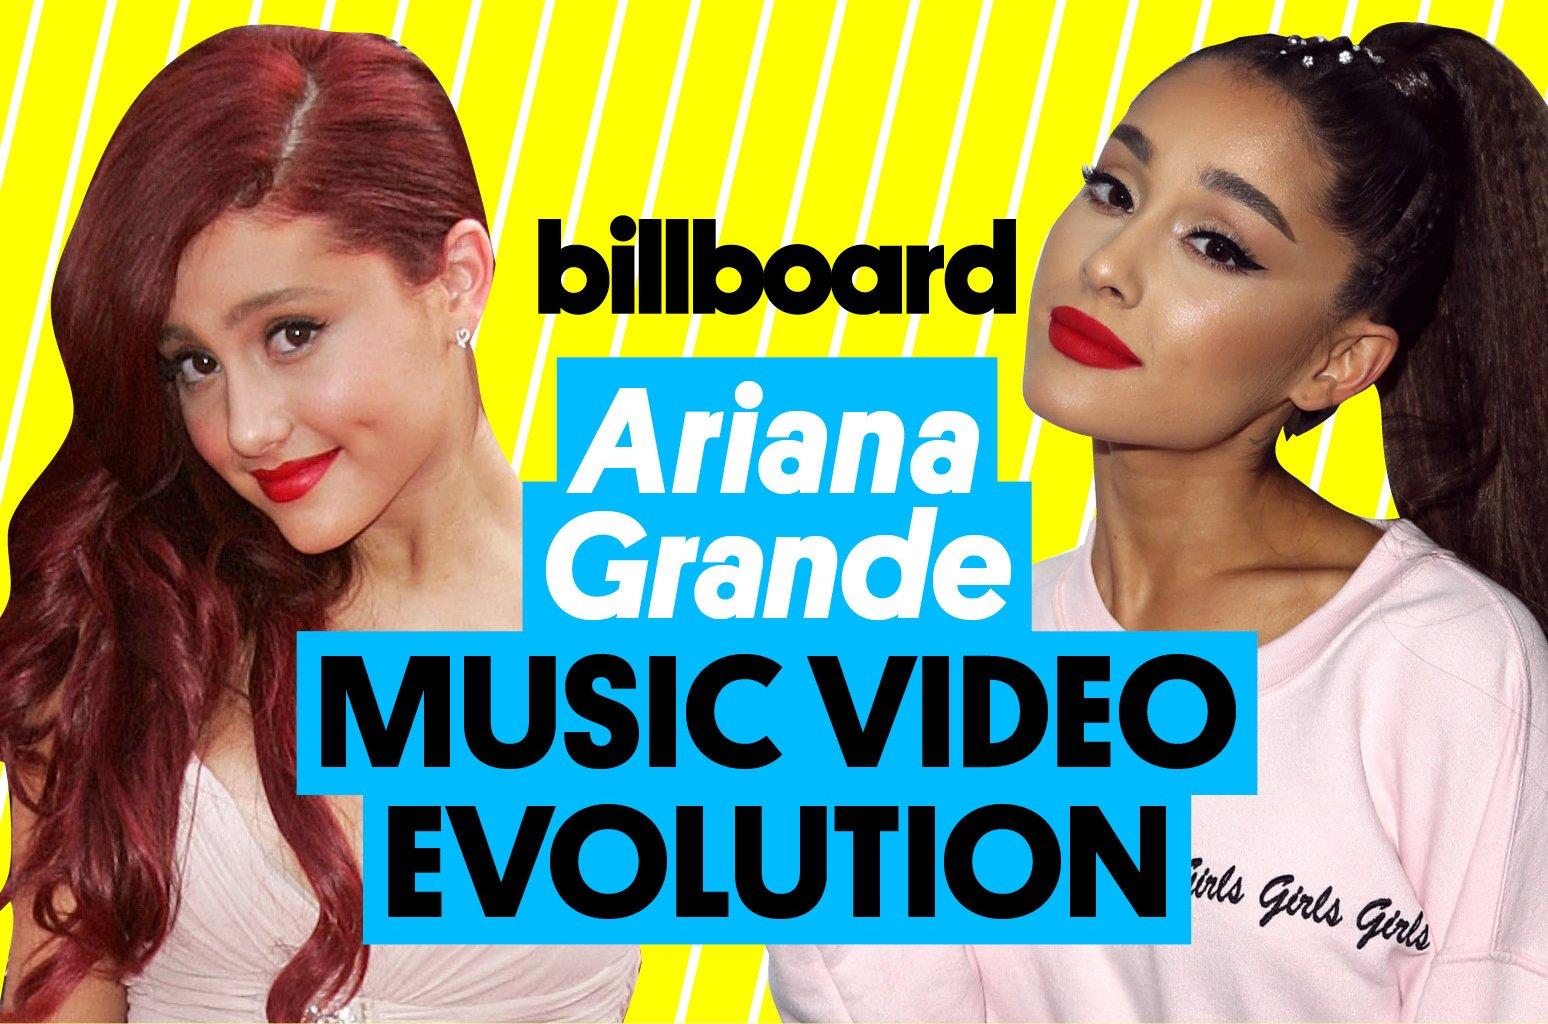 From 2012 to today, here is Ariana Grande's music video evolution https://t.co/gk1ELlJzm8 https://t.co/gMKAcH7uRd